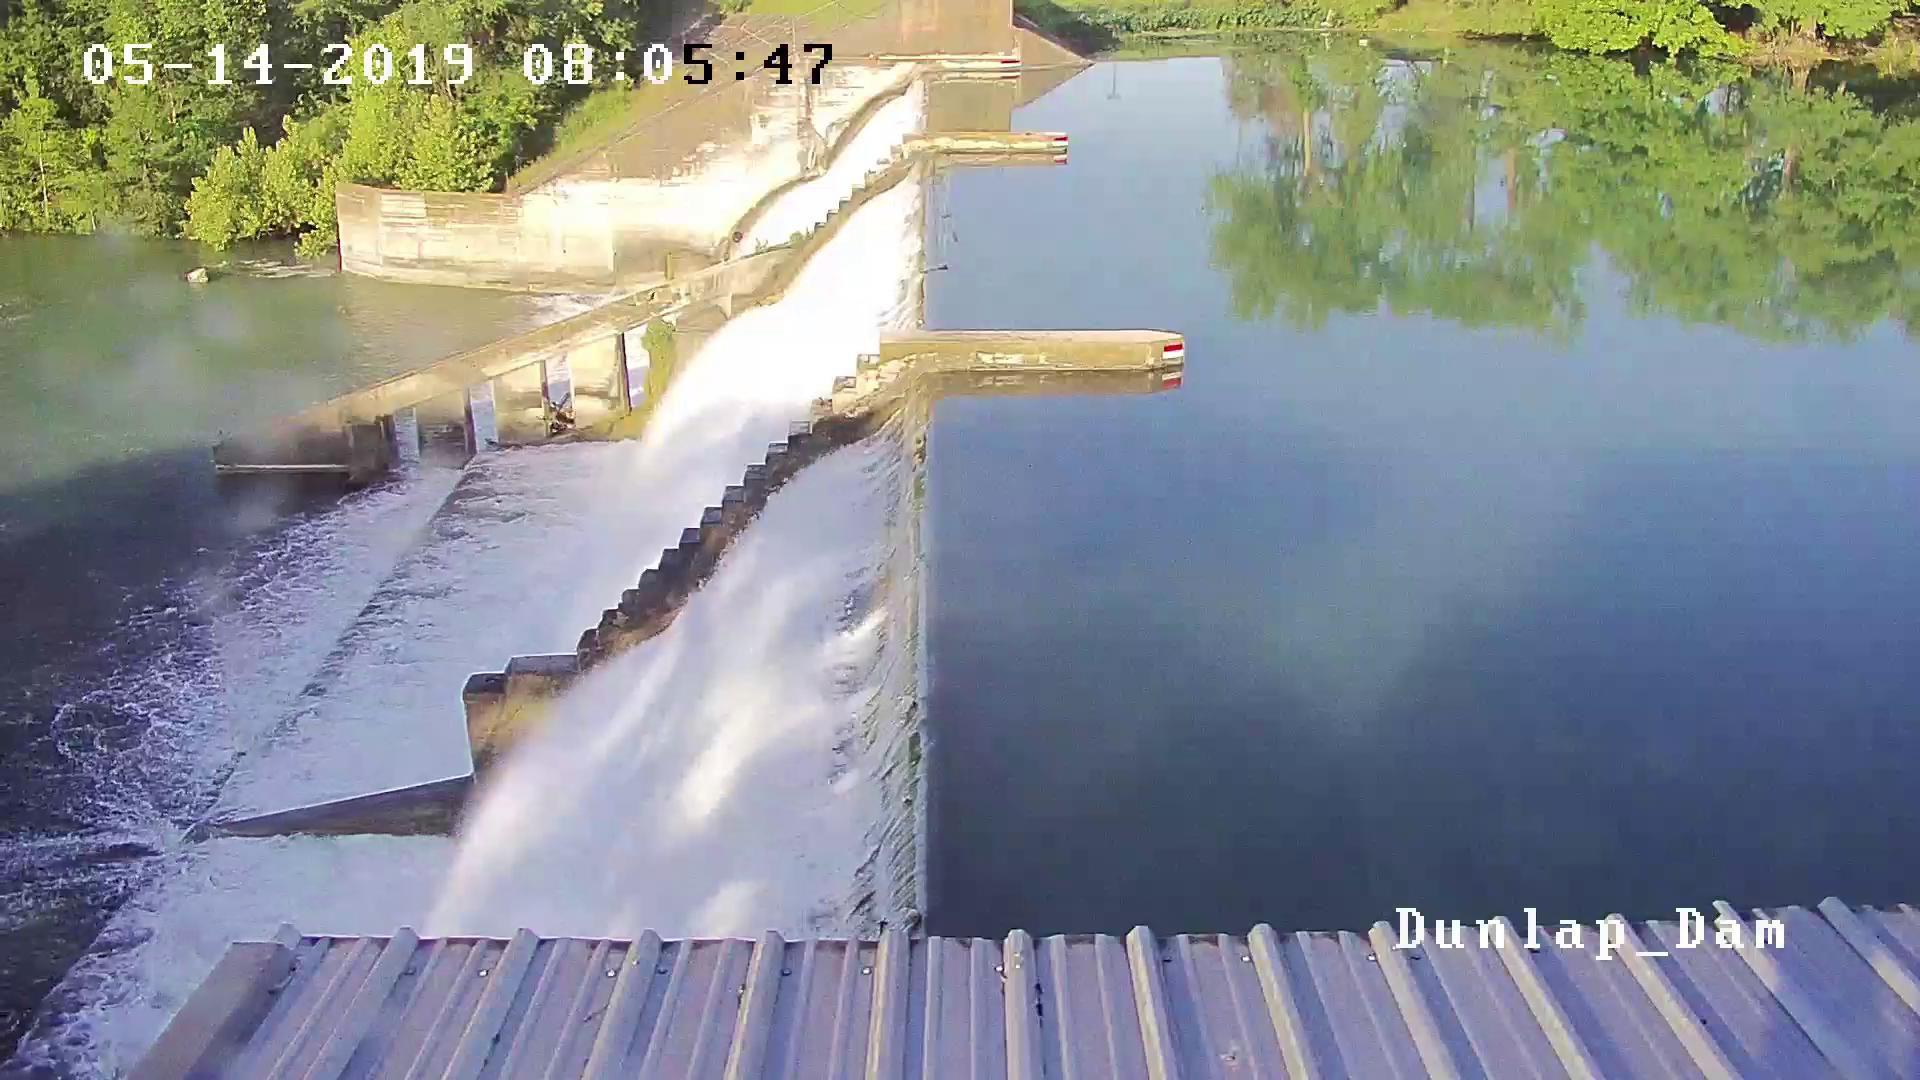 Dunlap Dam Failure